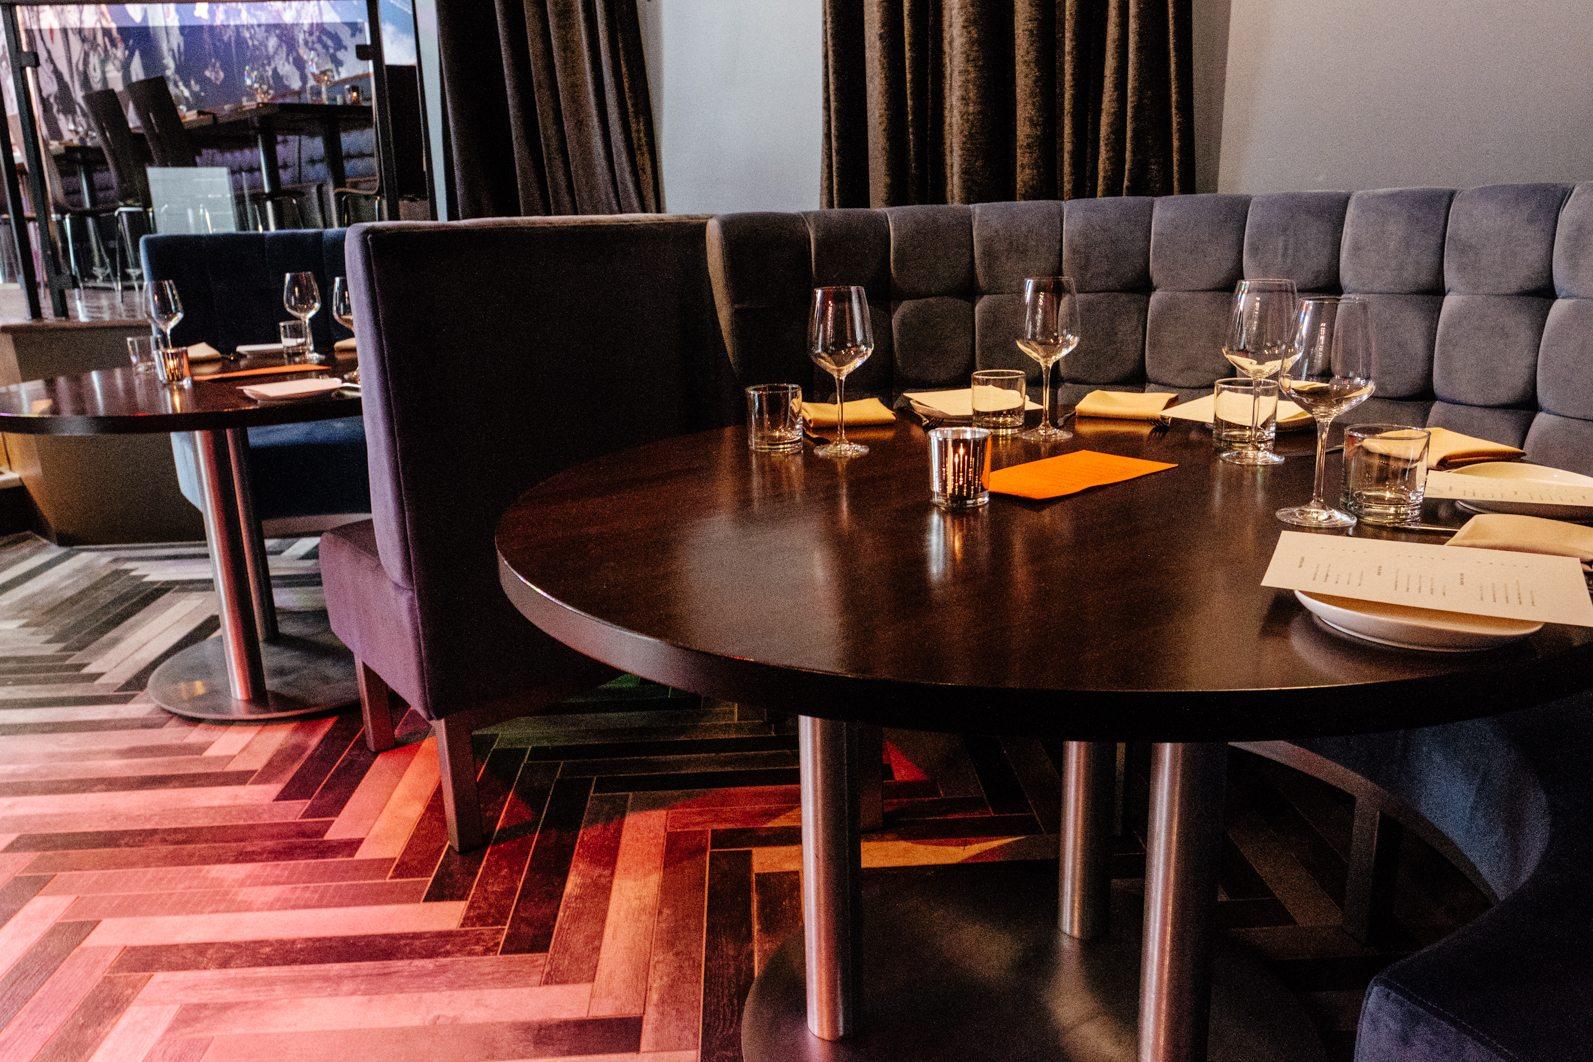 toronto-restaurants-figures-comic-book-super-heroes-yorkville-tables